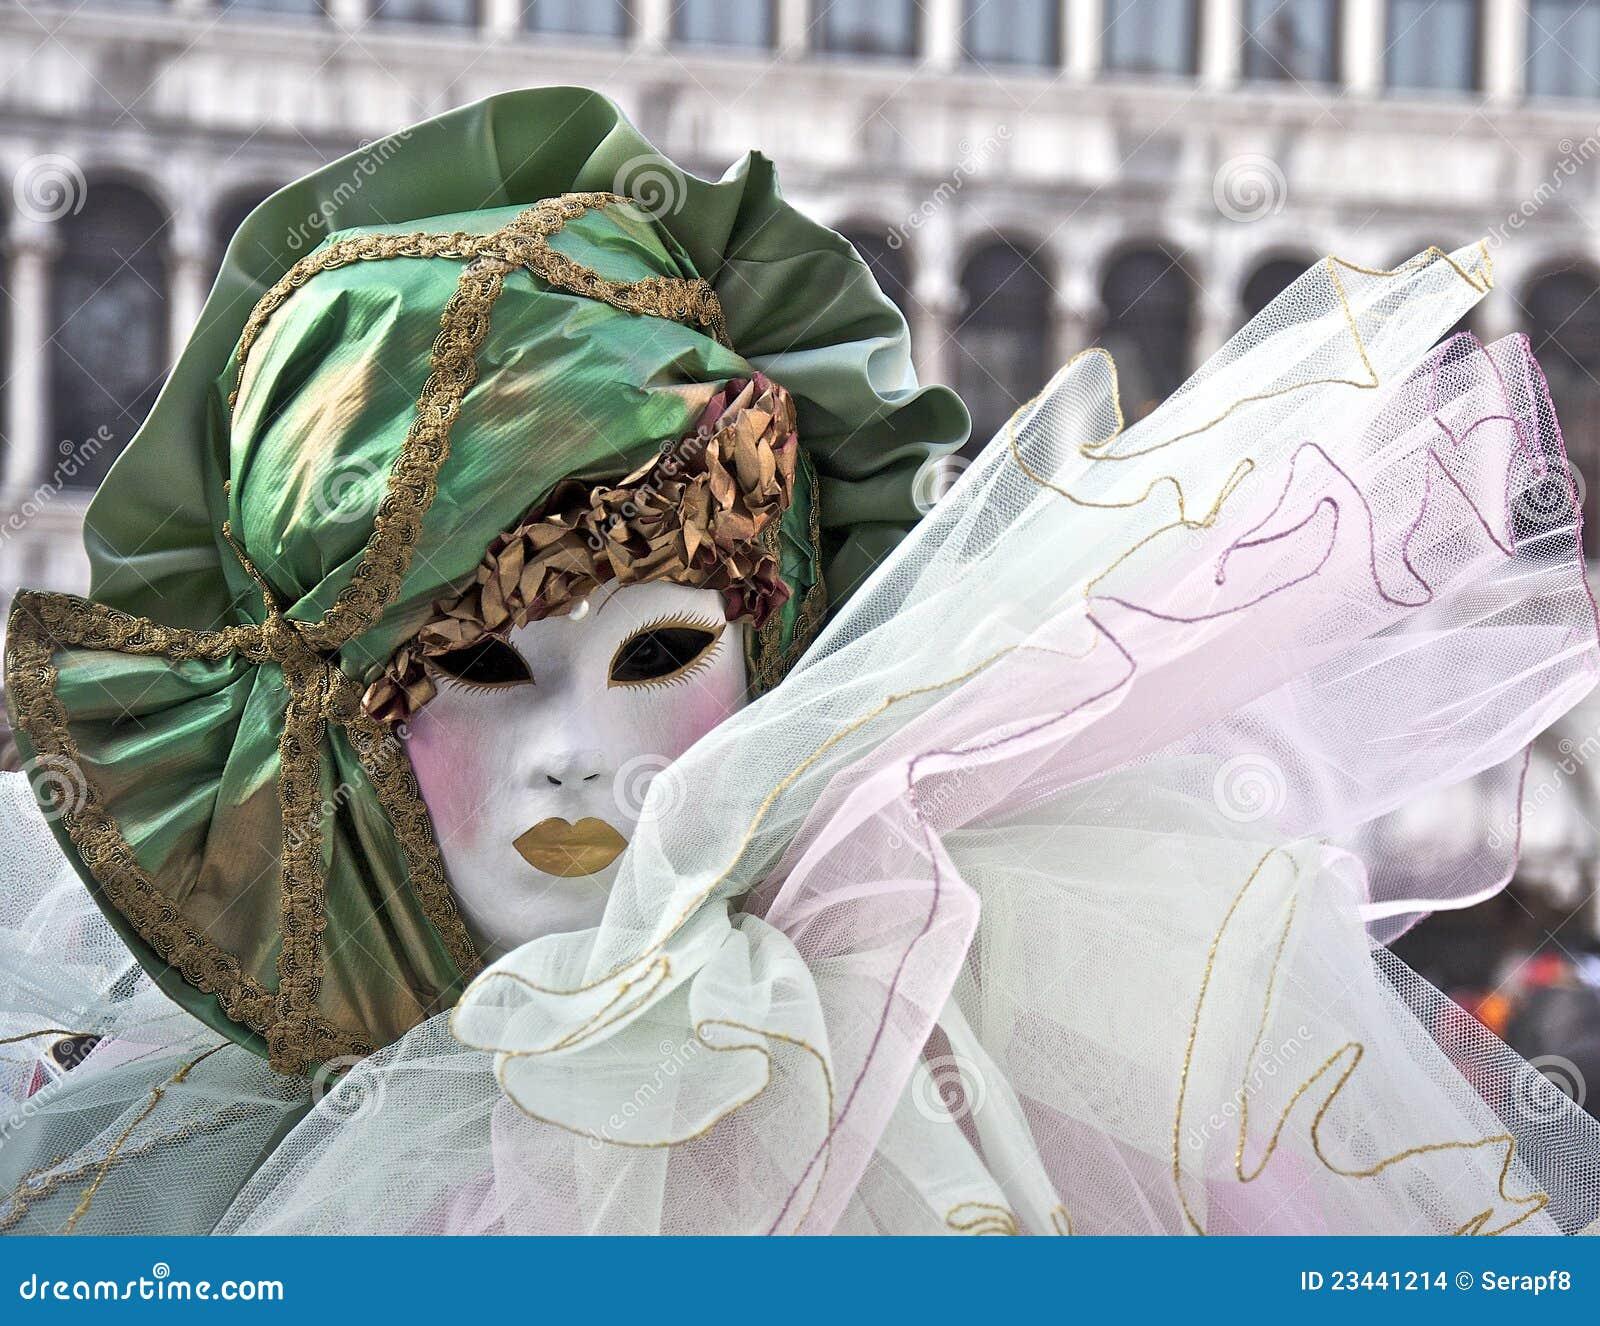 Carnival Venice, Mask